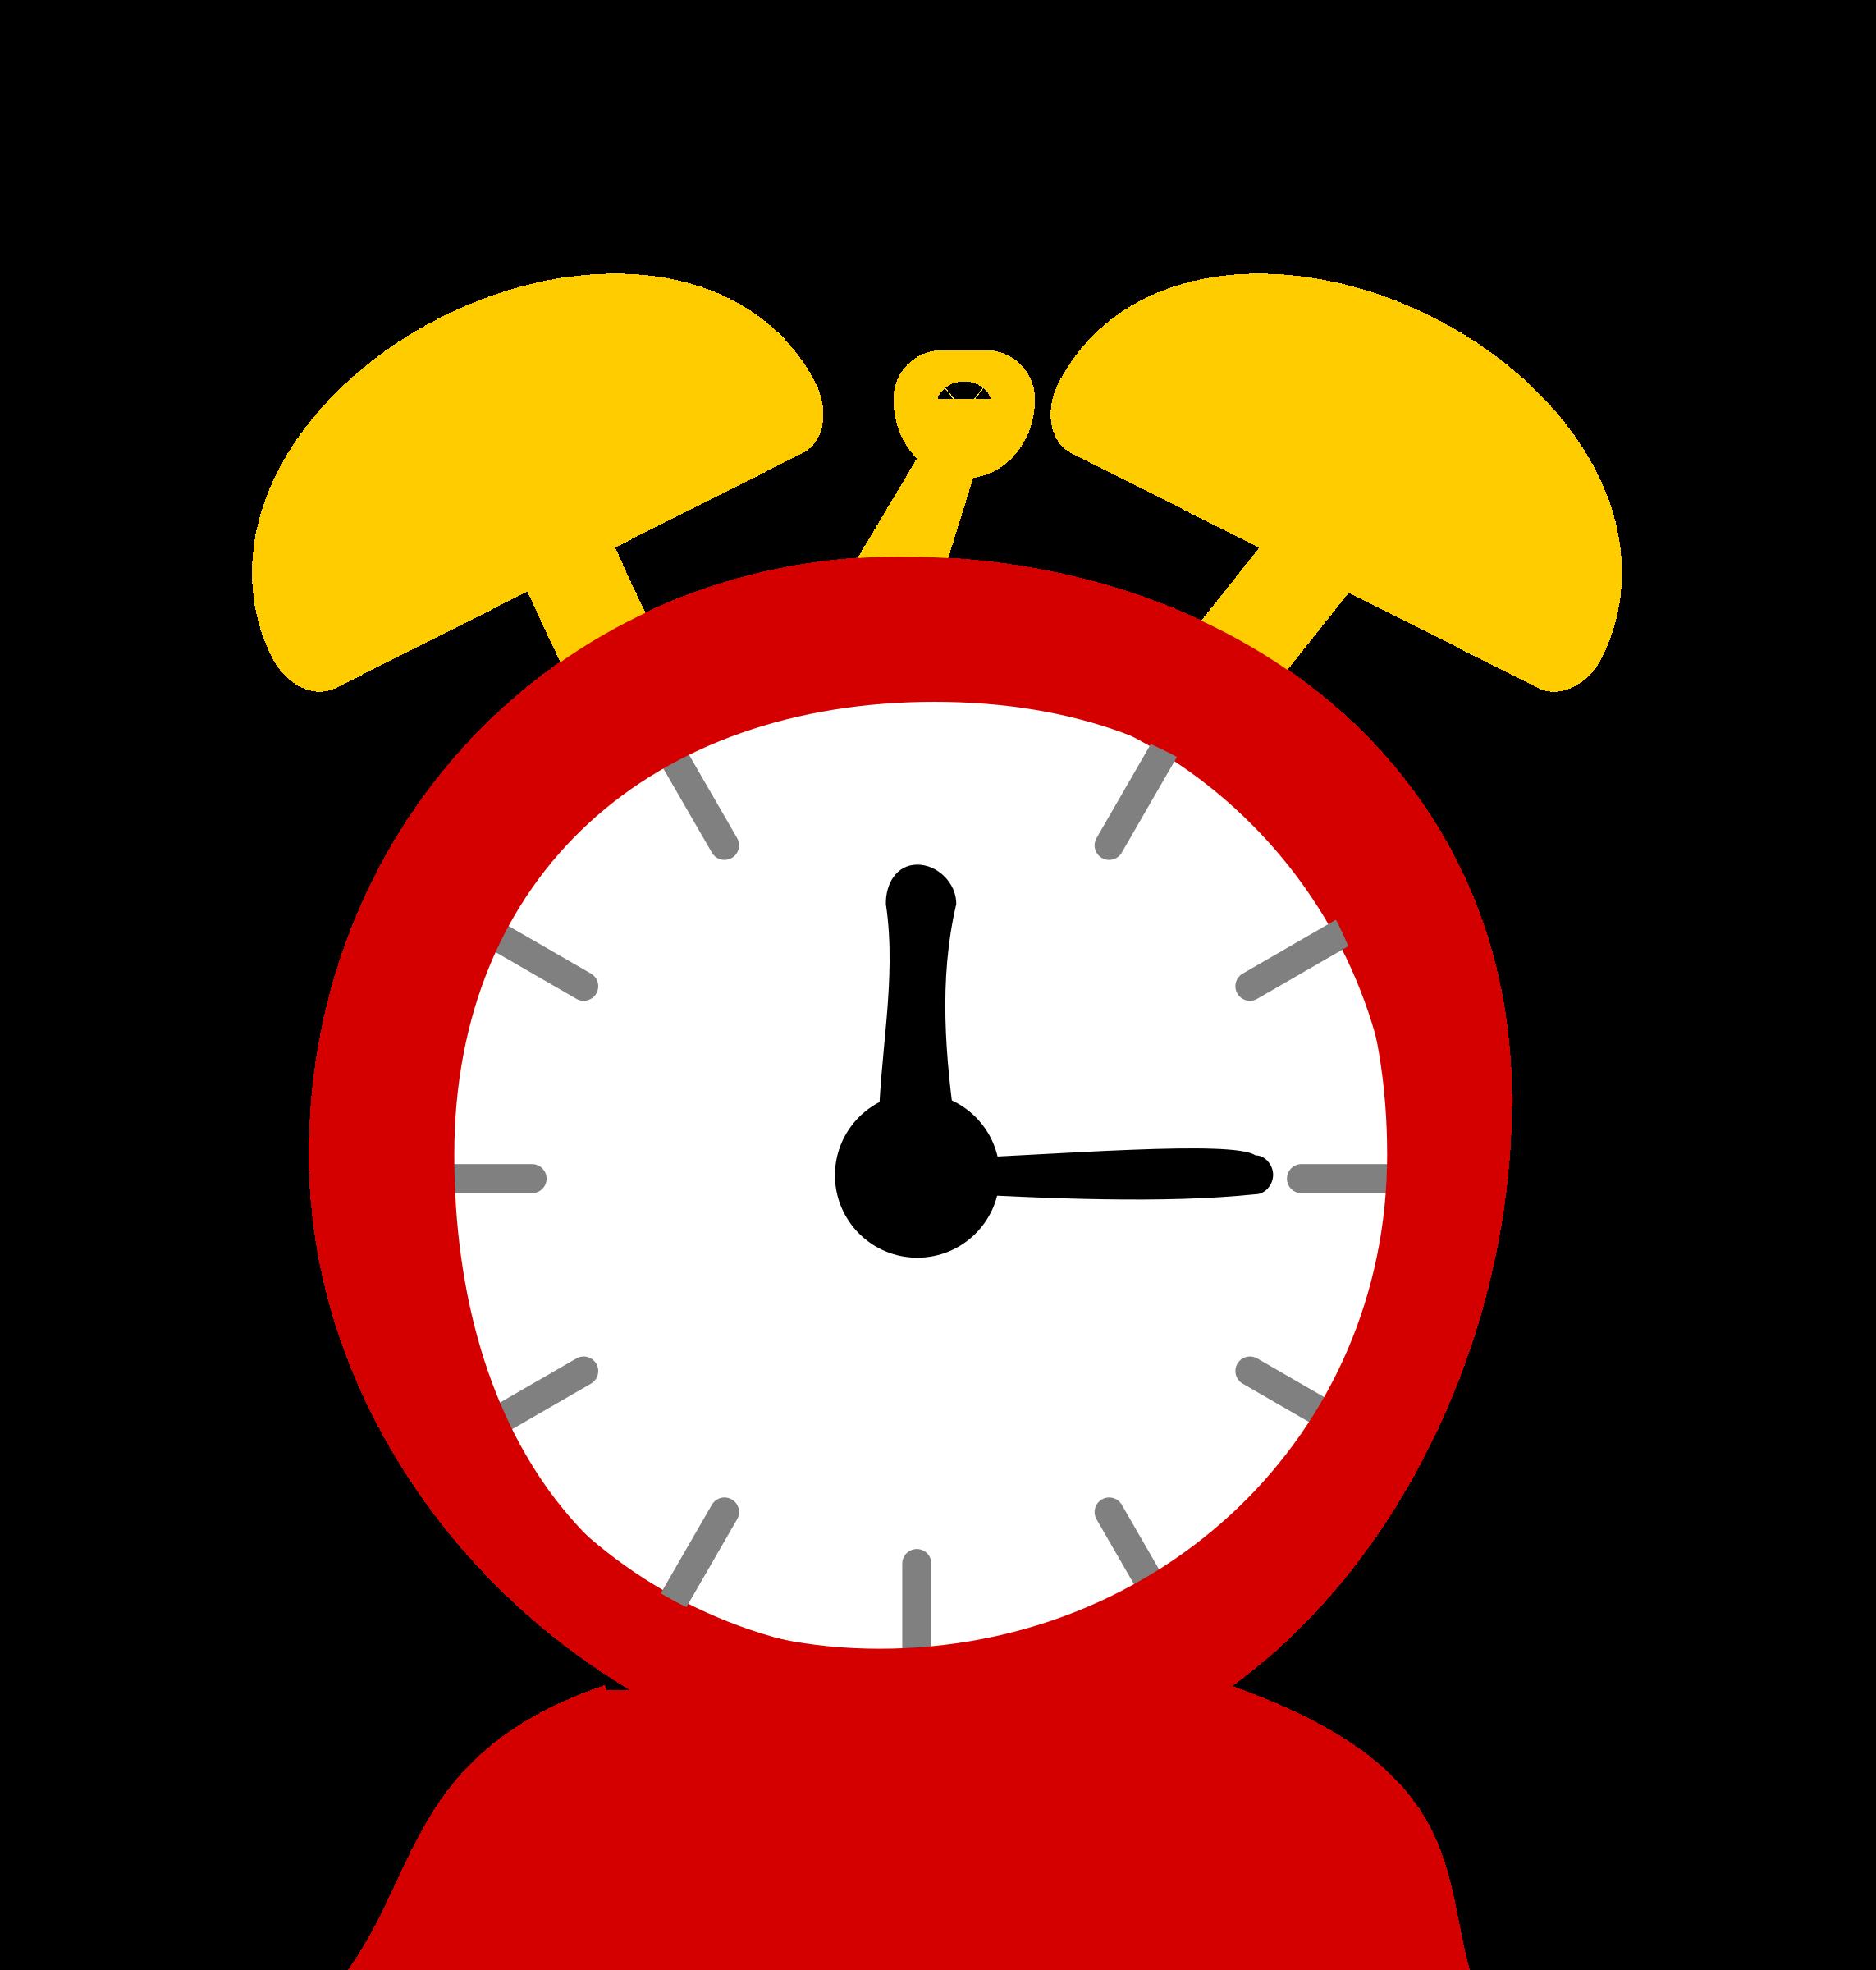 Colouful clipart alarm clock #8